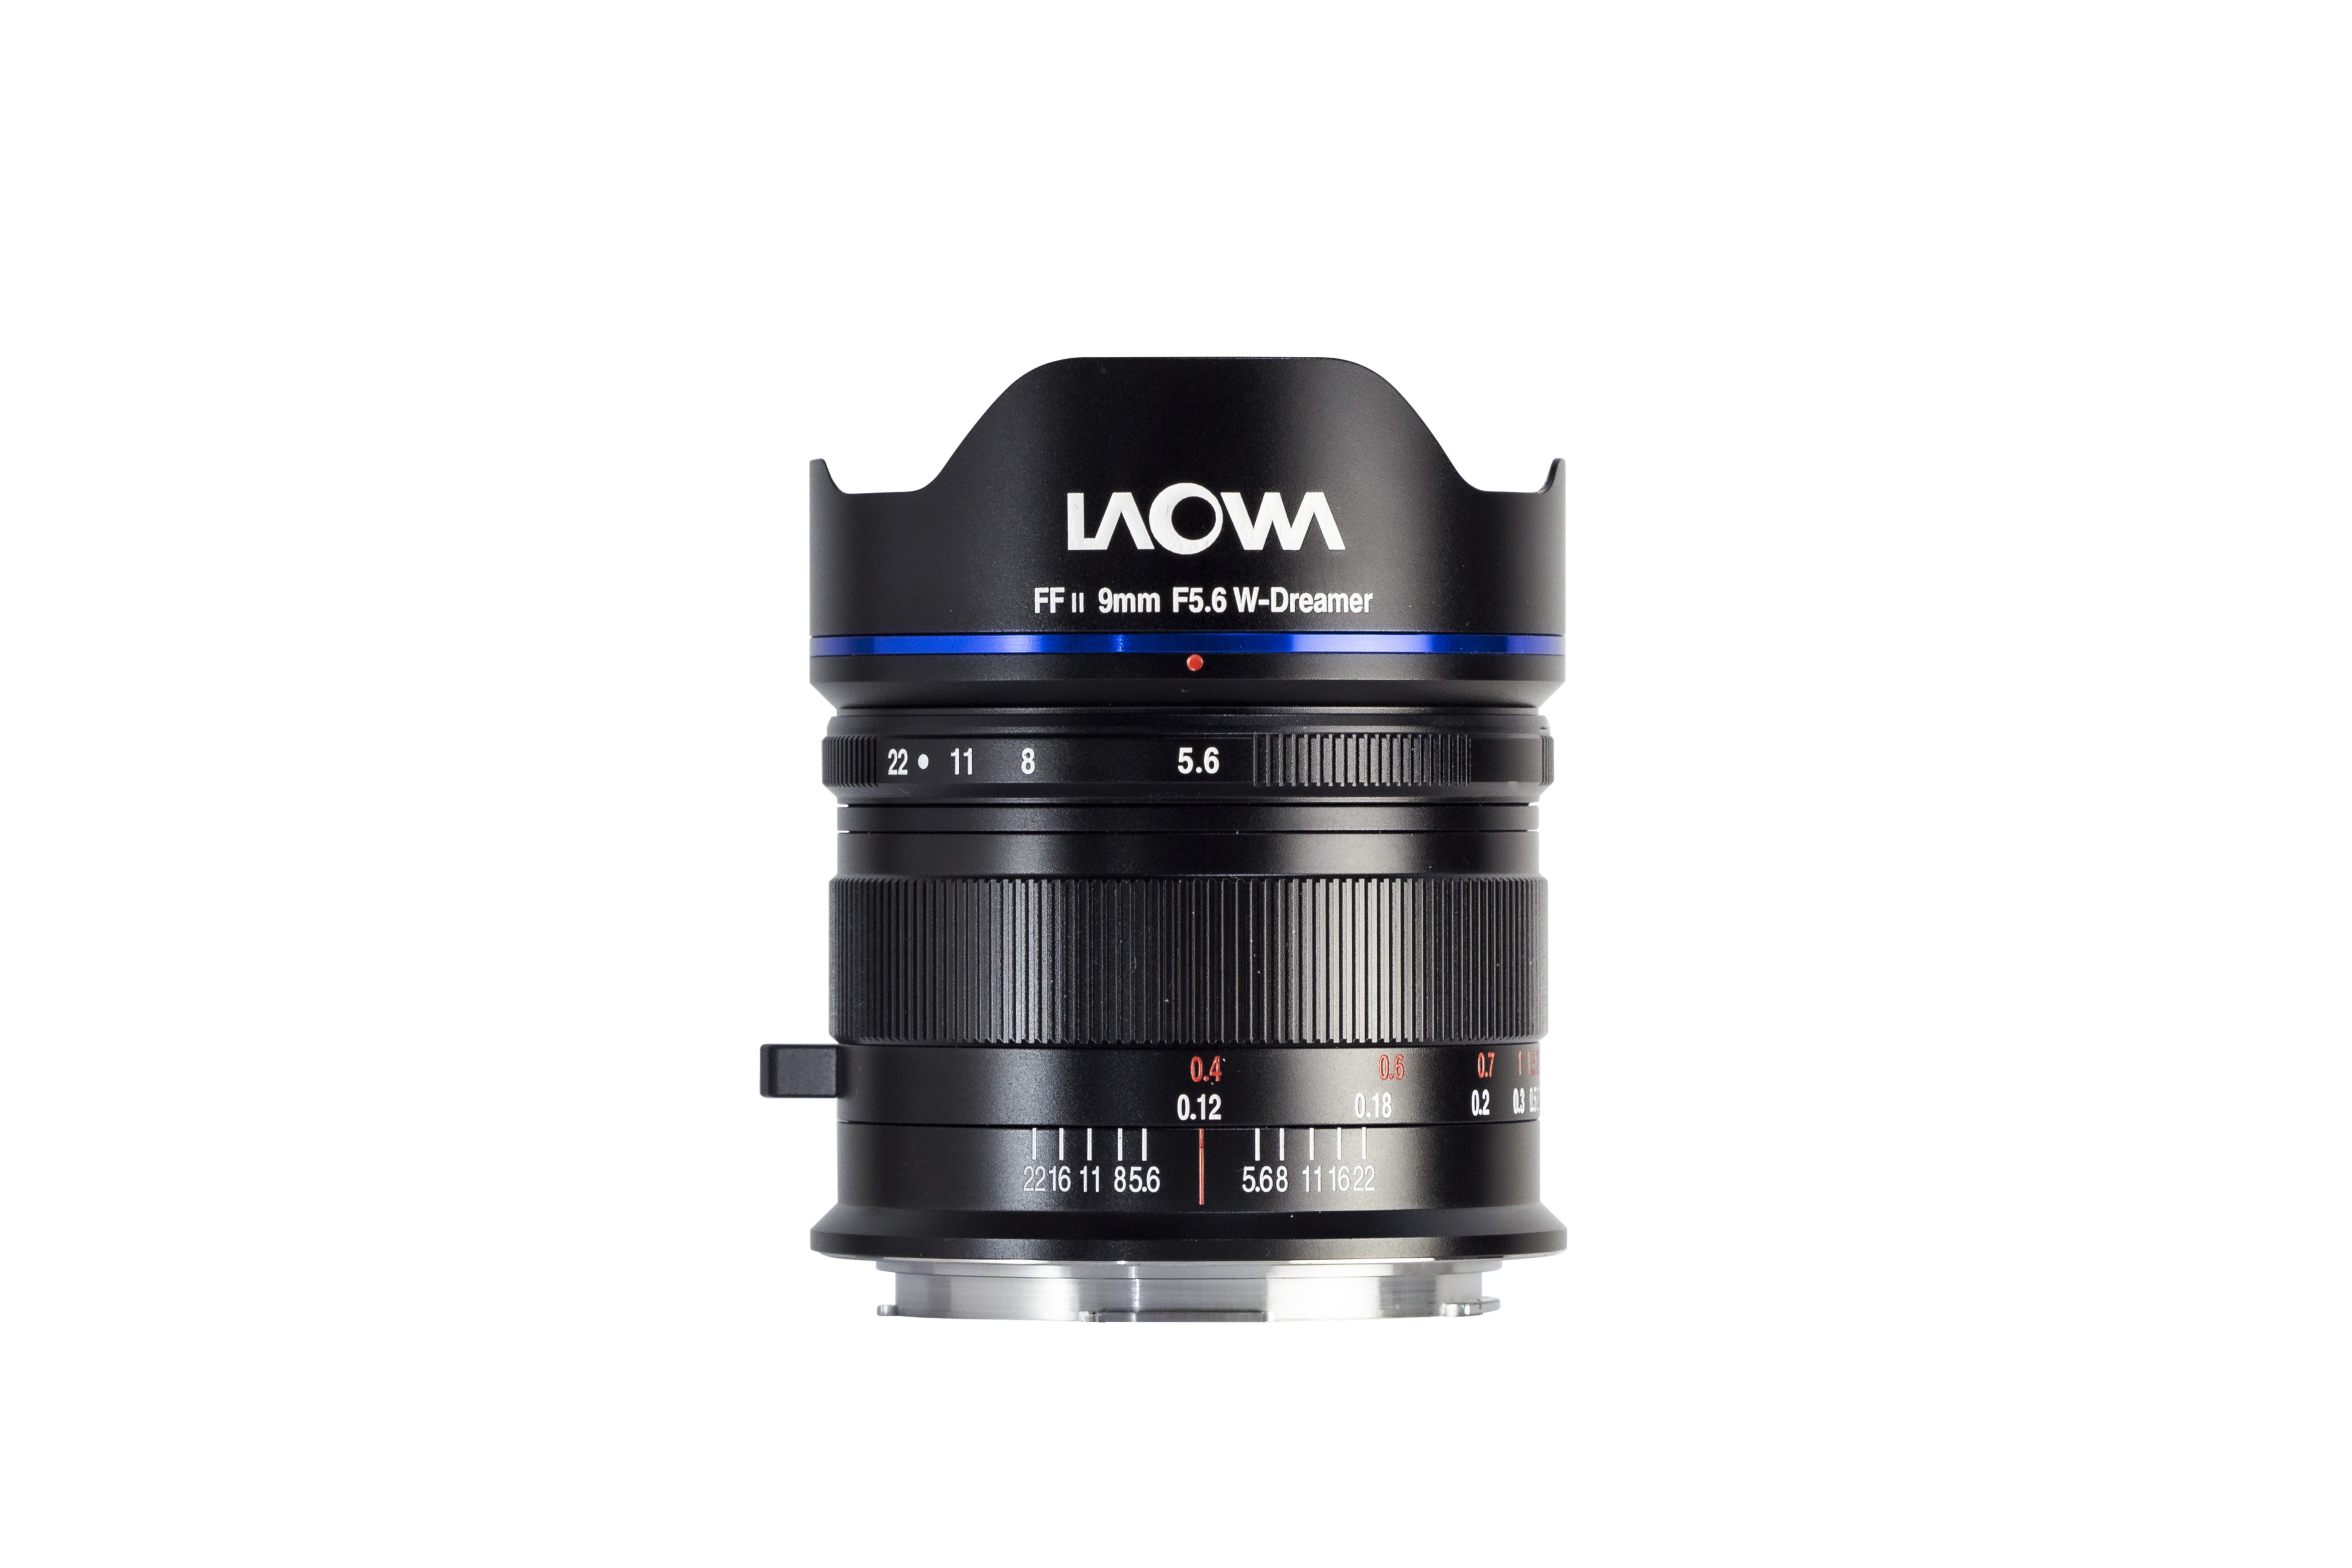 LAOWA 9mm F5.6 W-Dreamer 各マウント